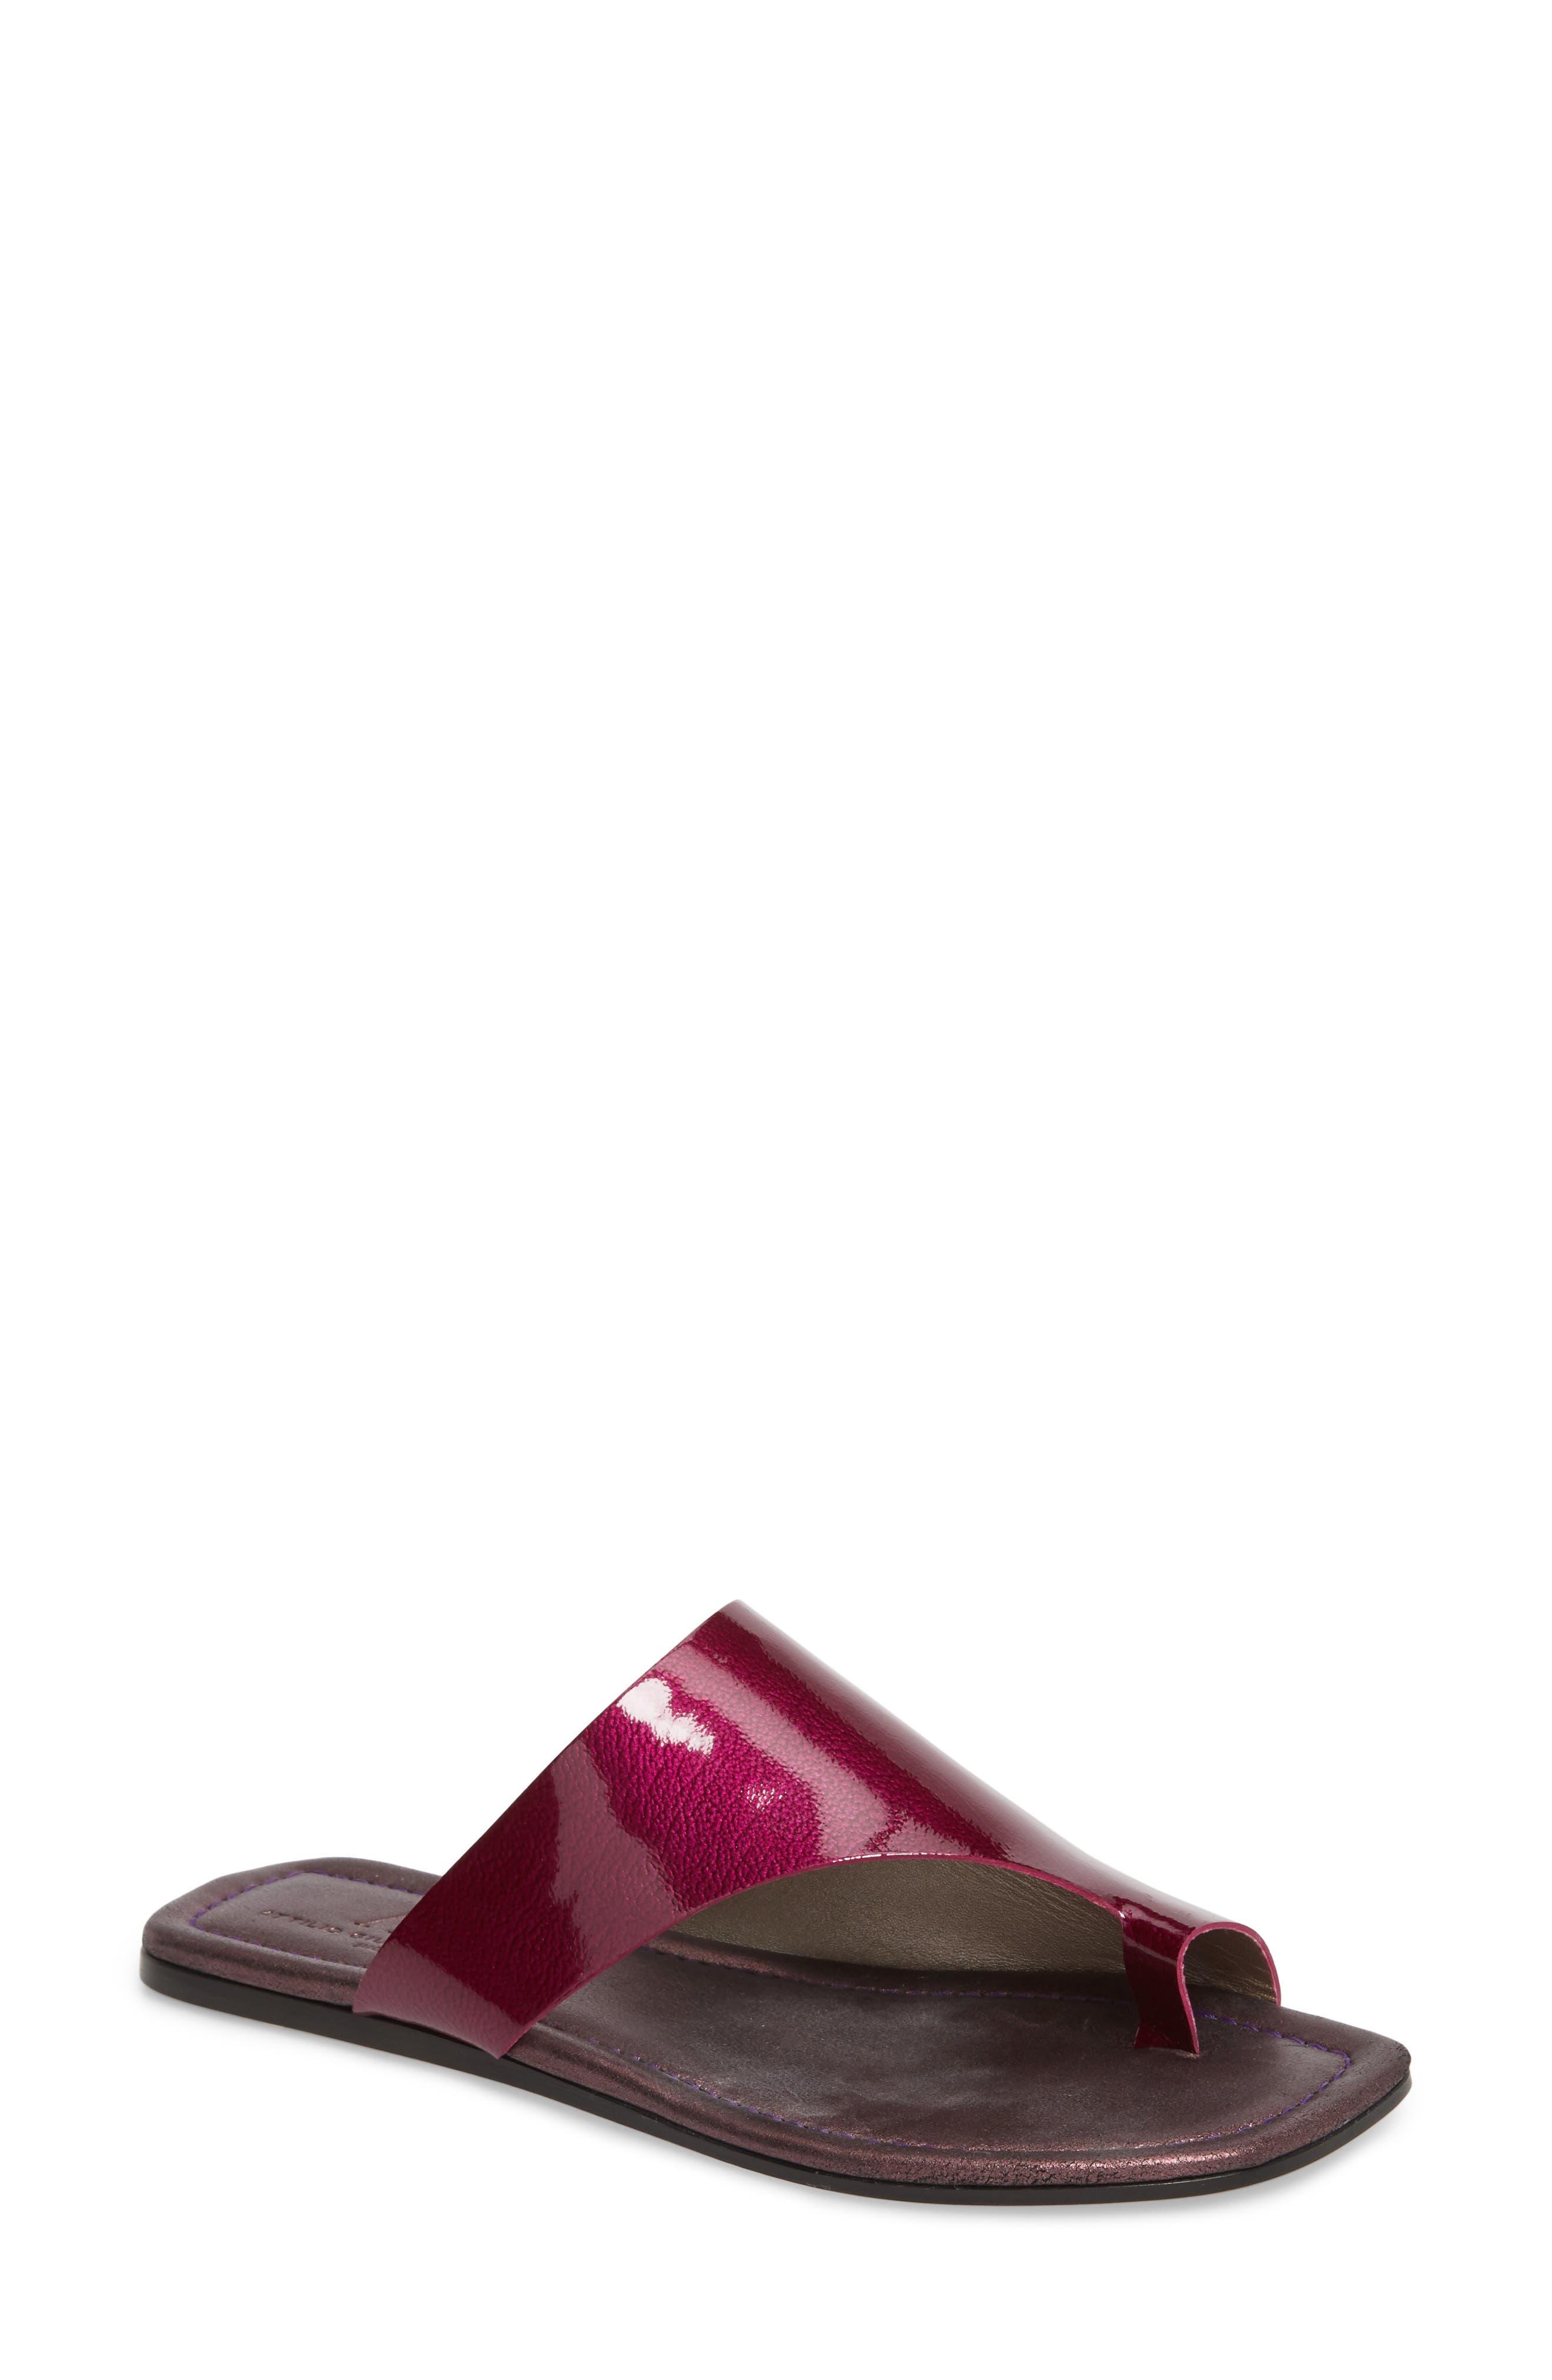 Asymmetrical Toe Thong Sandal,                             Main thumbnail 1, color,                             Fuchsia Patent